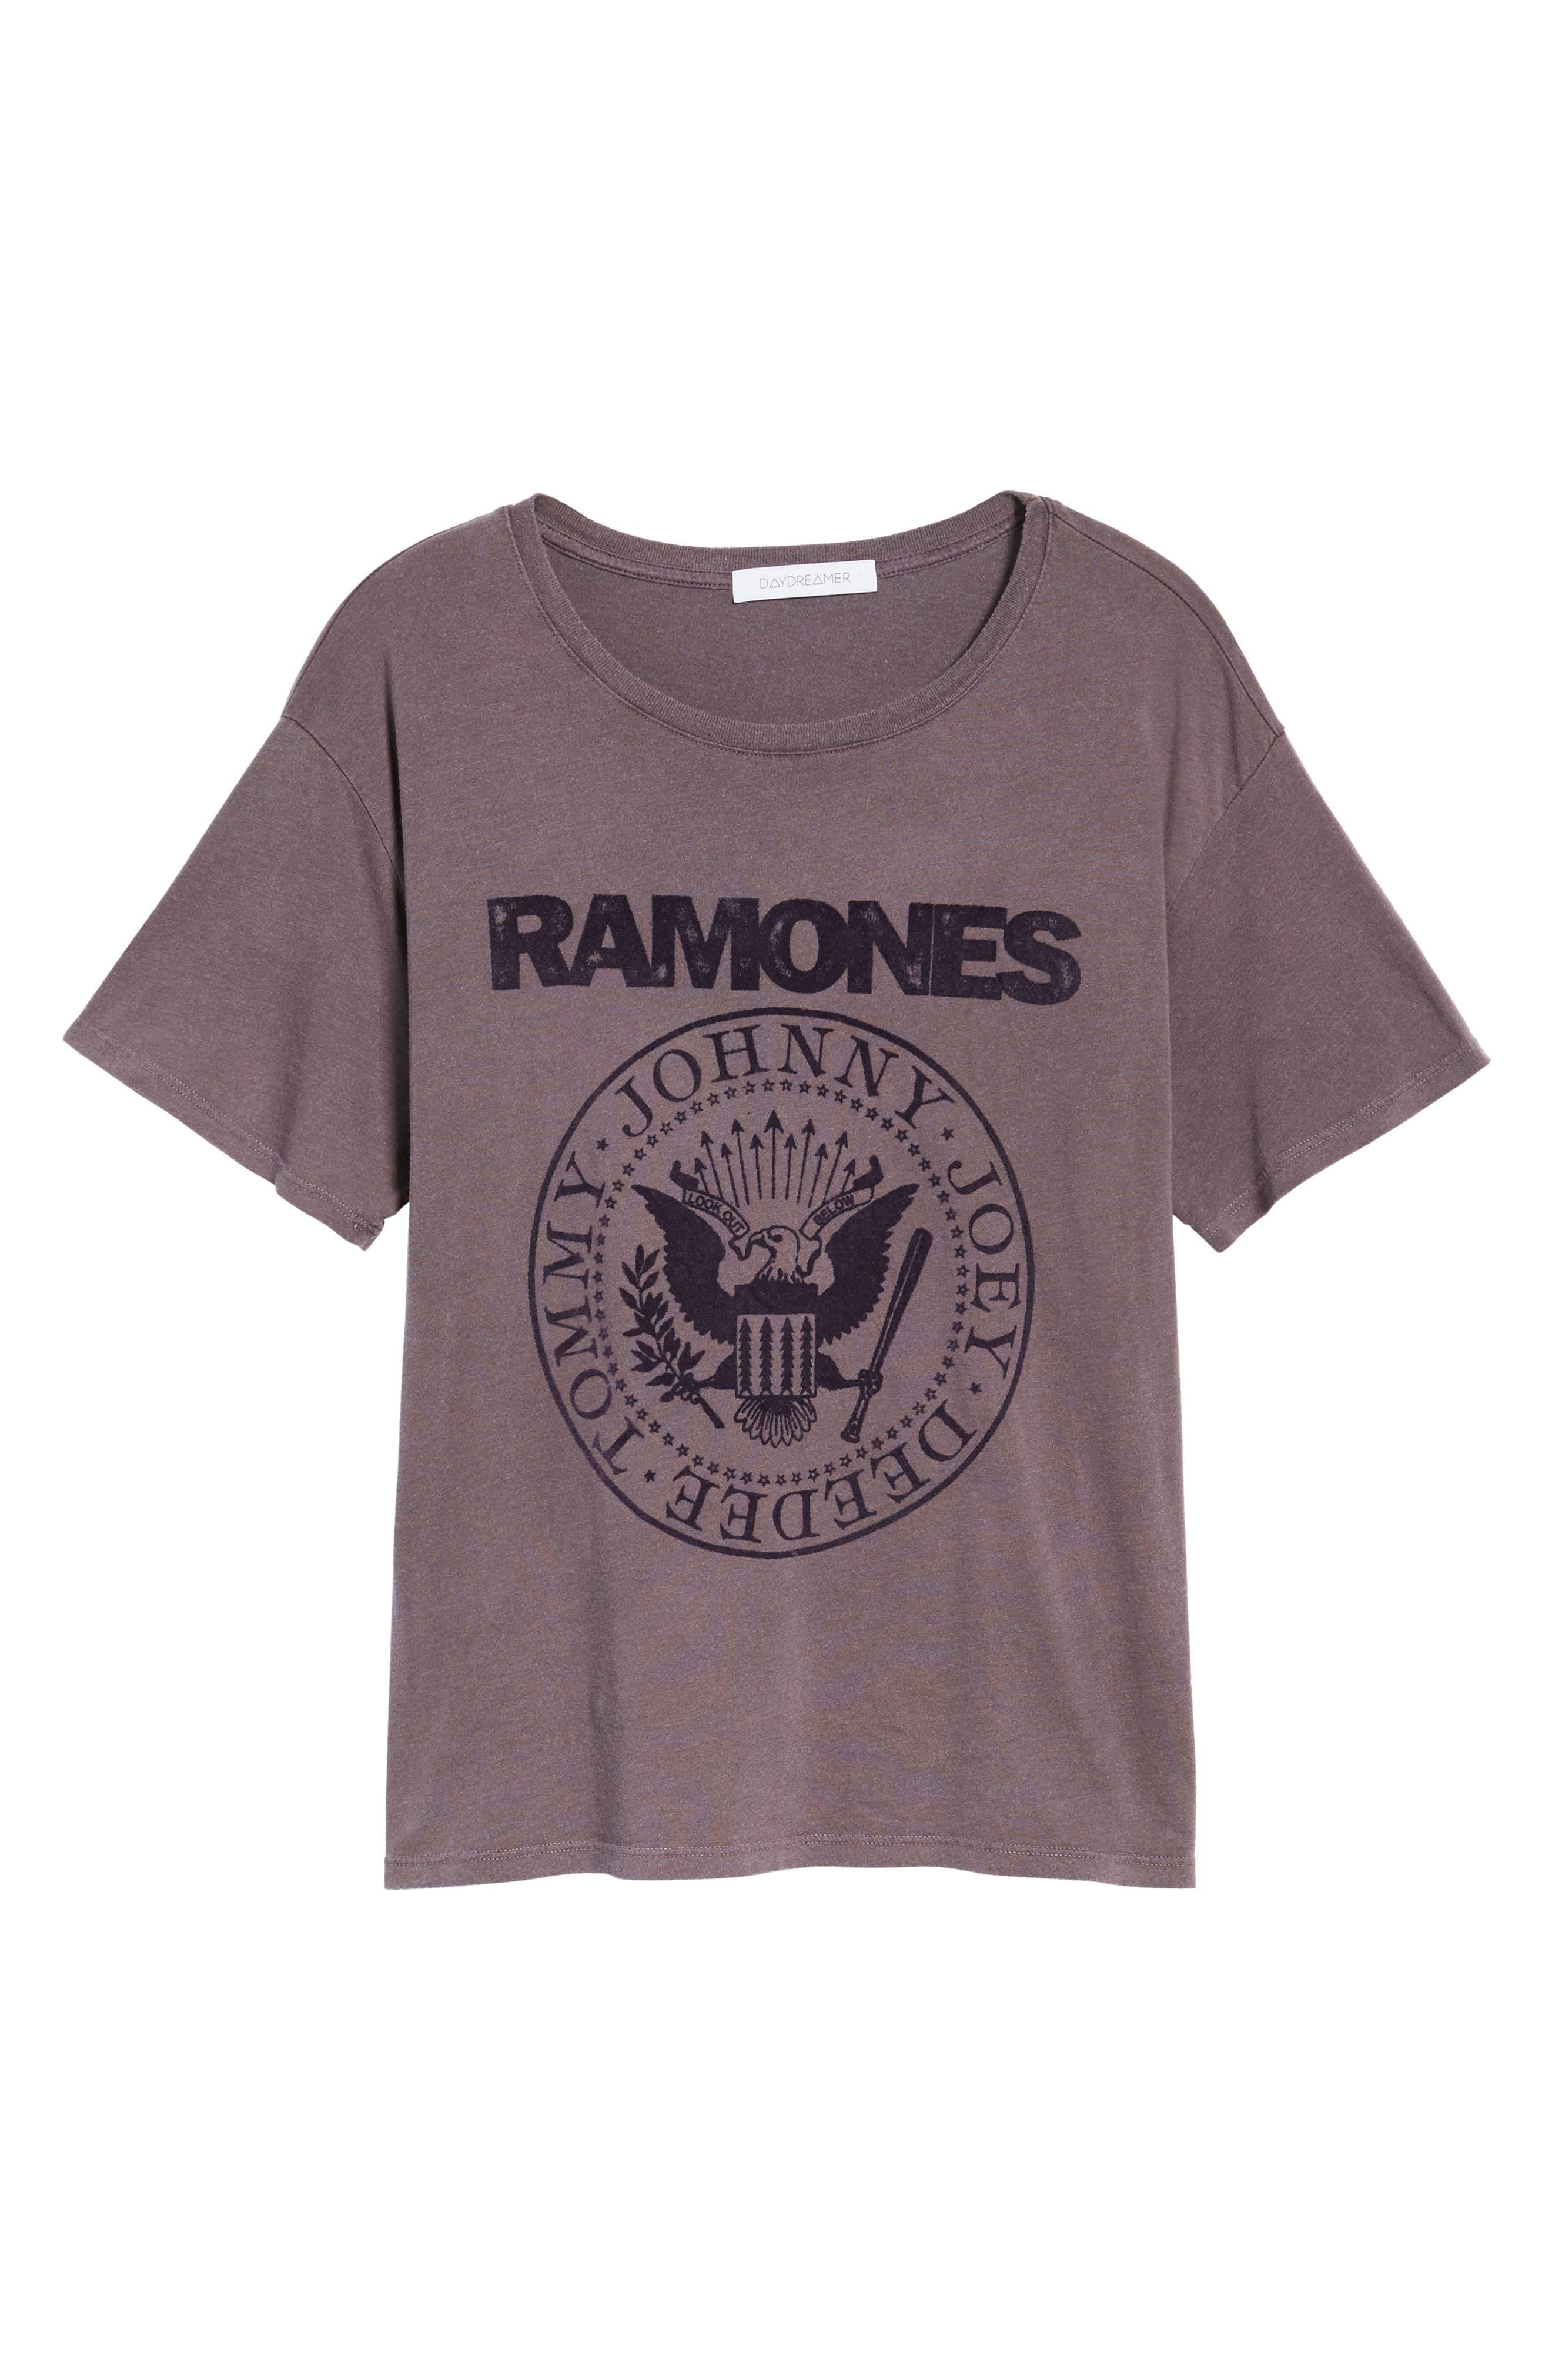 Ramones Tee,                             Alternate thumbnail 6, color,